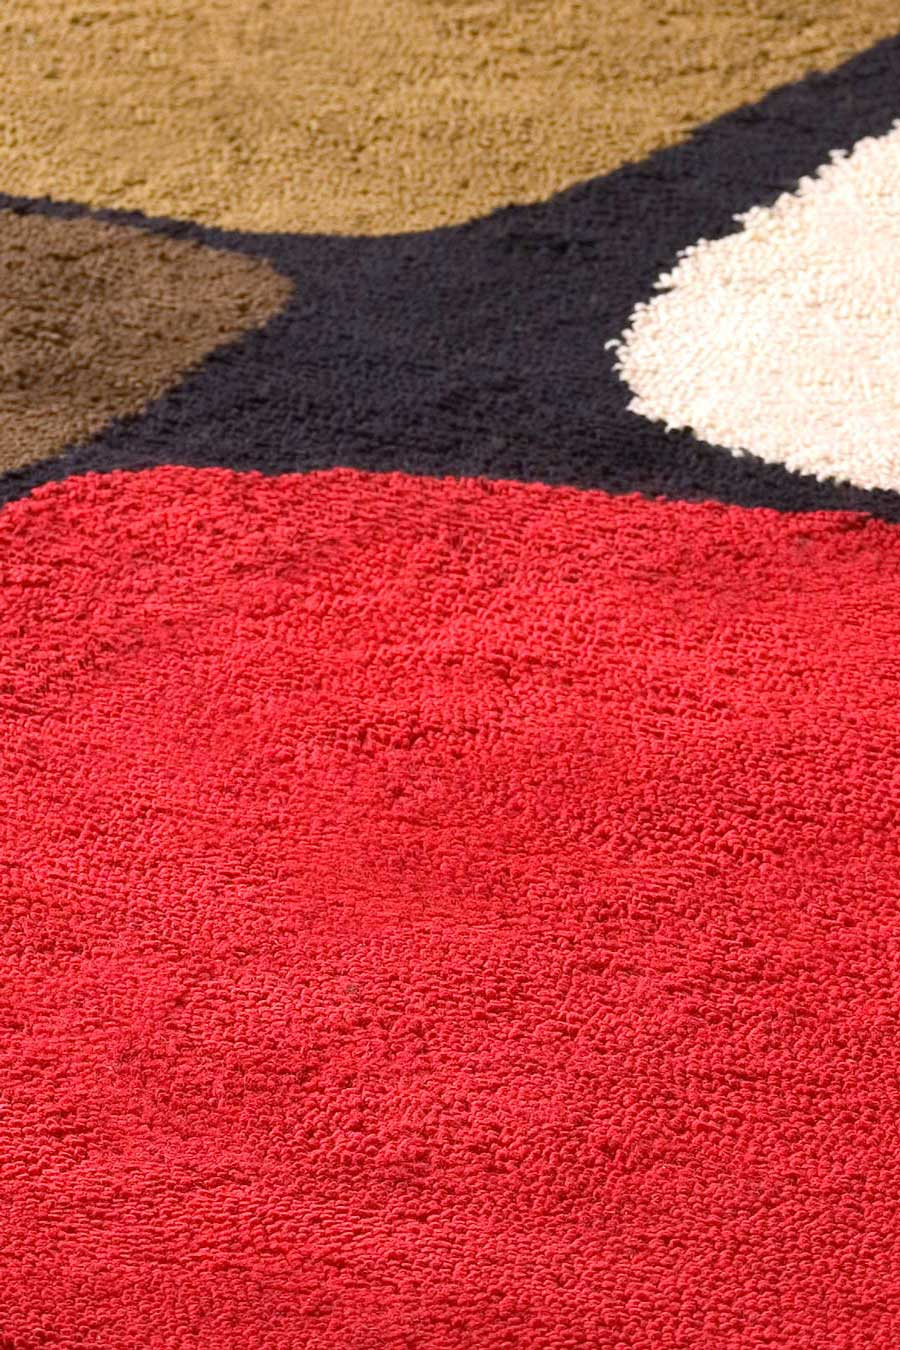 close up of boulder 1 rug by dinosaur designs red brown